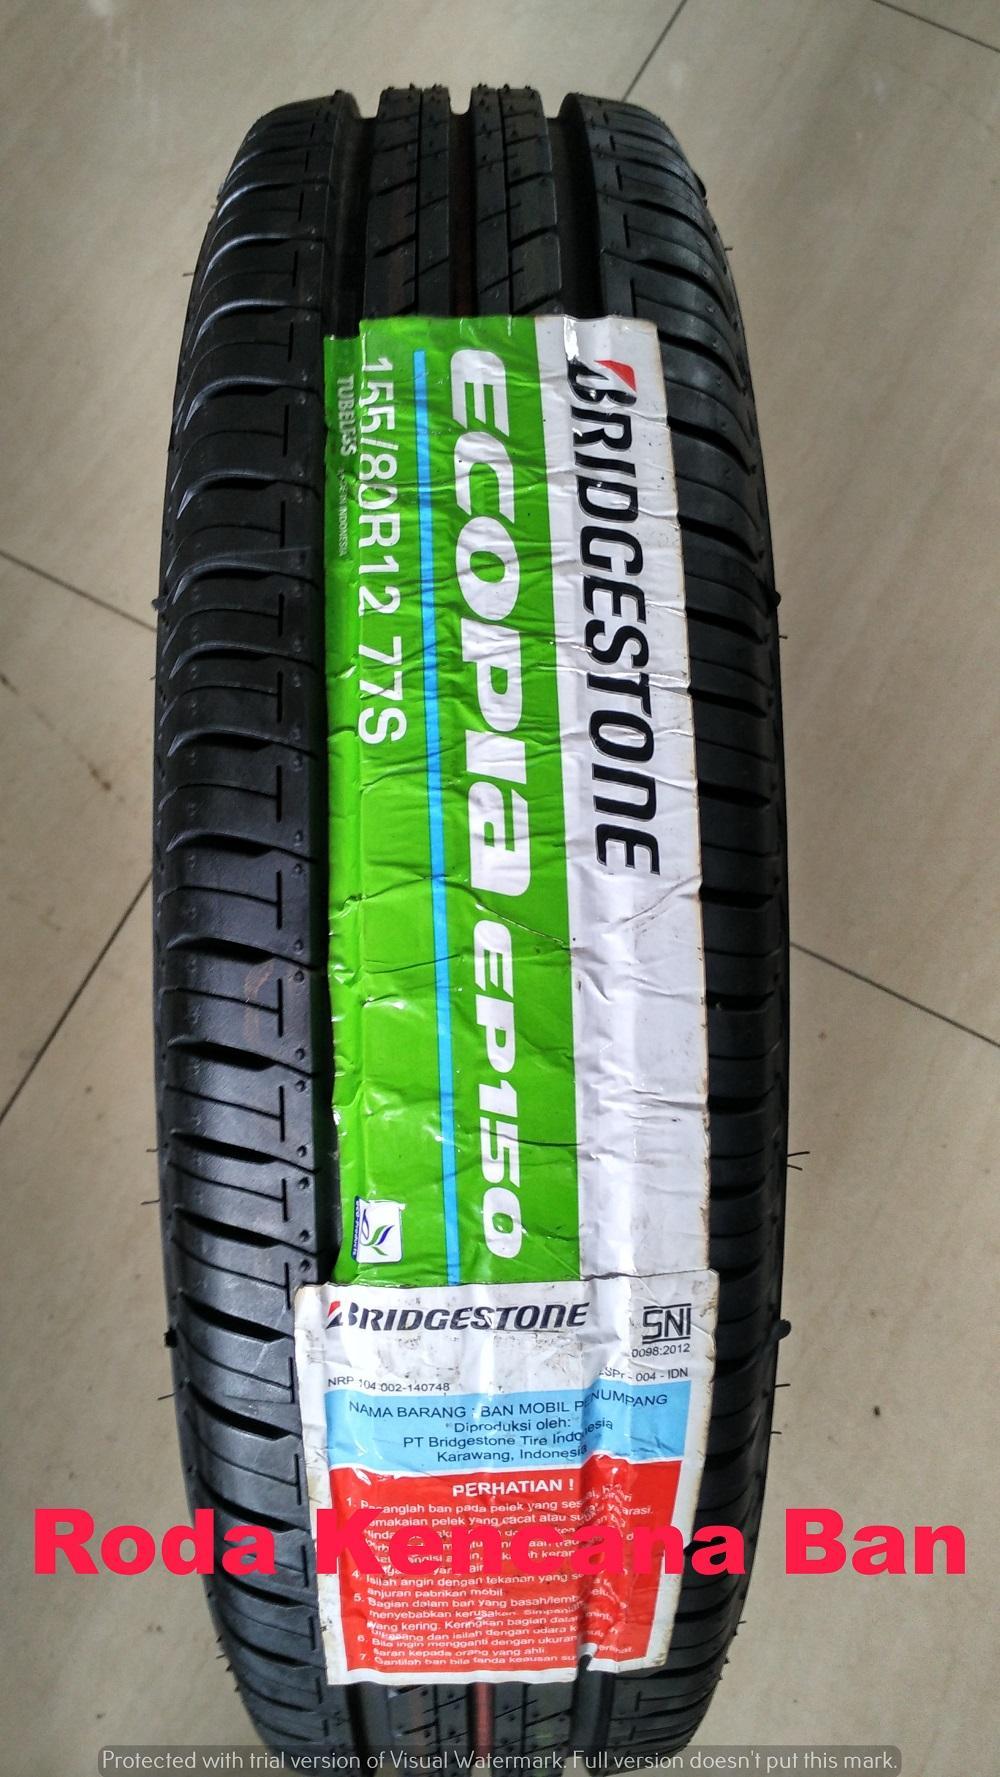 Bridgestone Ecopia Ep150 185 65r15 Ban Mobil 1 Set 4 Pcs Gratis Gt Champiro Bxt Pro 195 Vocer 155 80 R12